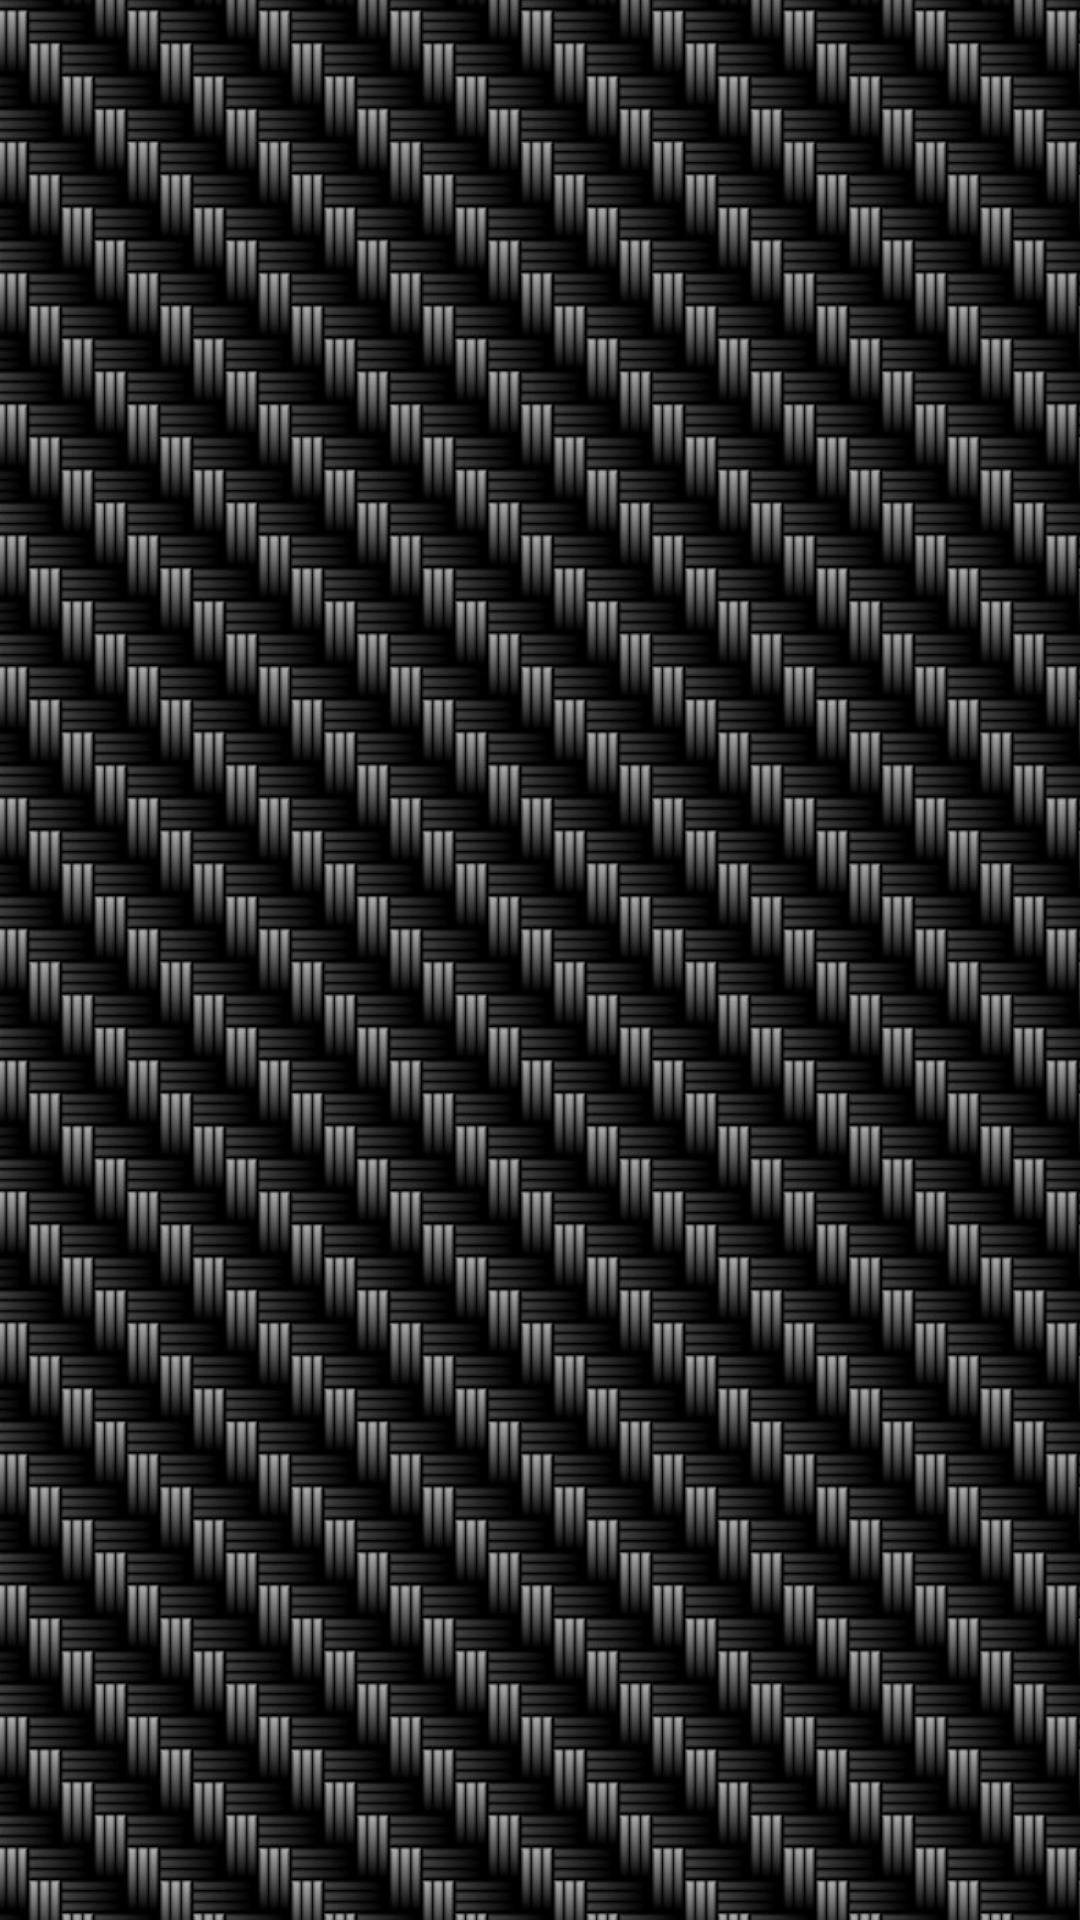 https://wallpaperformobile.org/15976/android-carbon-fiber-